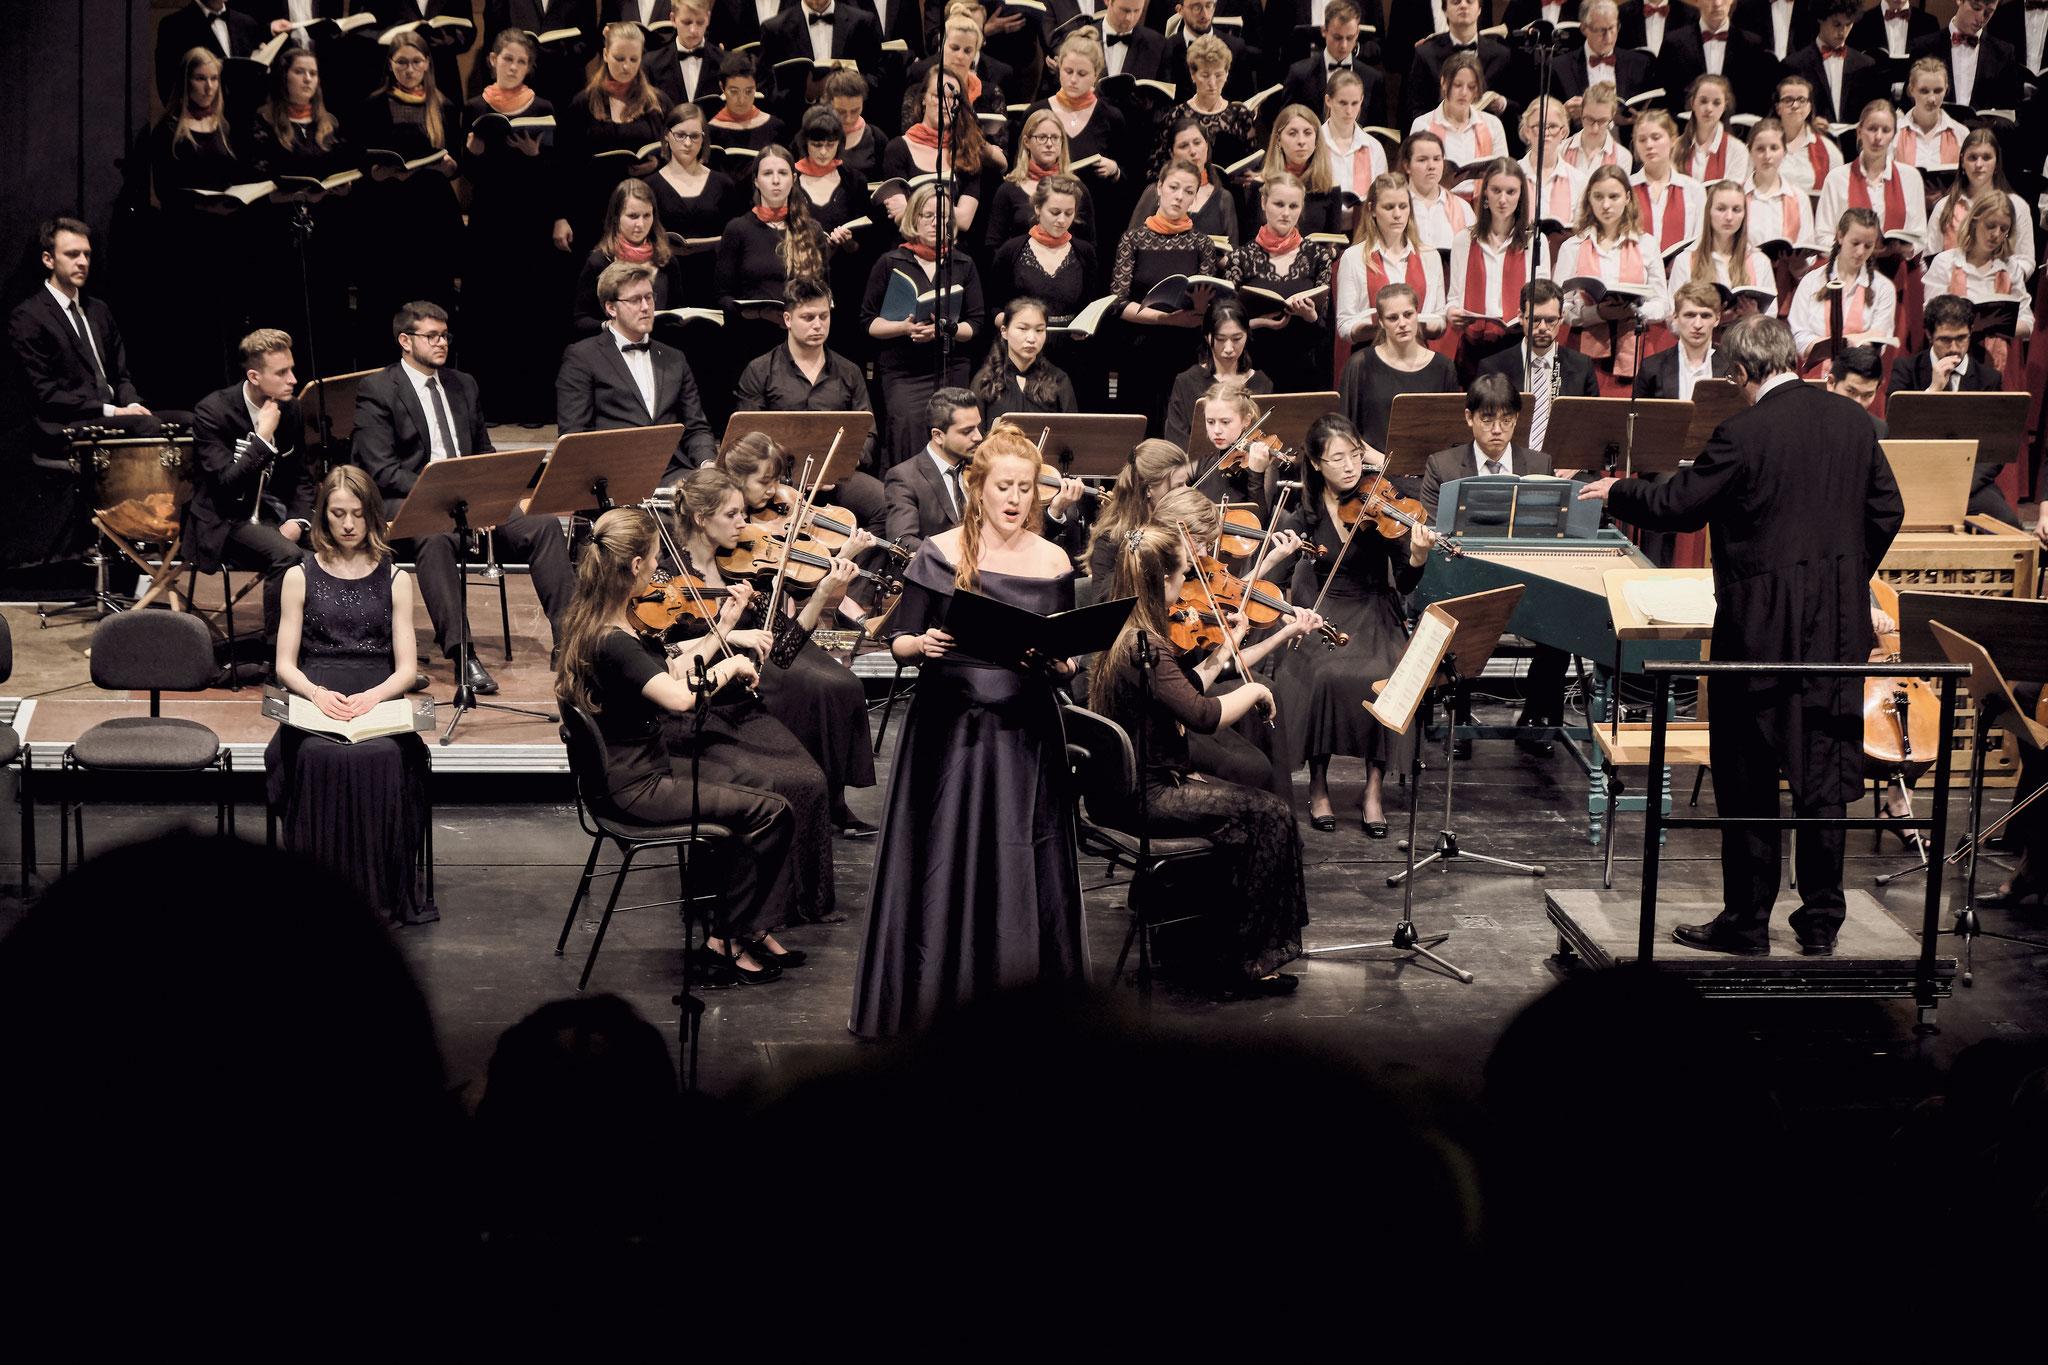 BACHFEST Rostock: H-Moll Messe 2019//Katharinensaal  - Foto: M. Dalchow